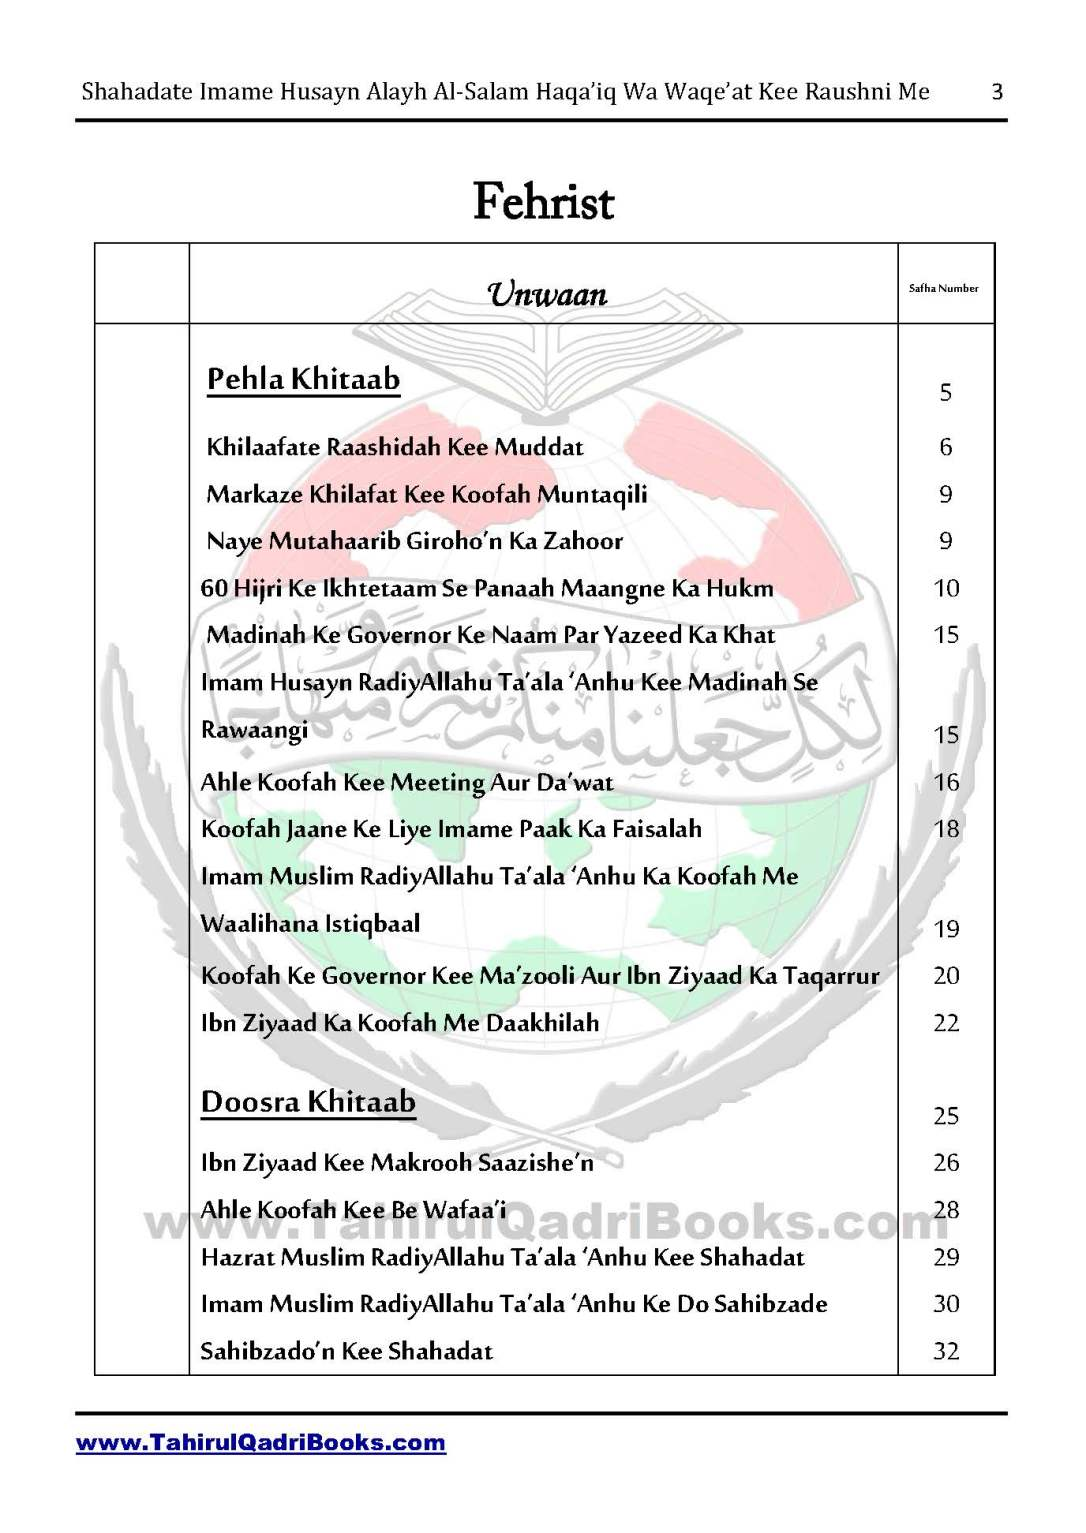 shahadate-imame-husayn-alayh-is-salam-haqaiq-wa-waqe_at-kee-raushni-me-in-roman-urdu-unlocked_Page_03